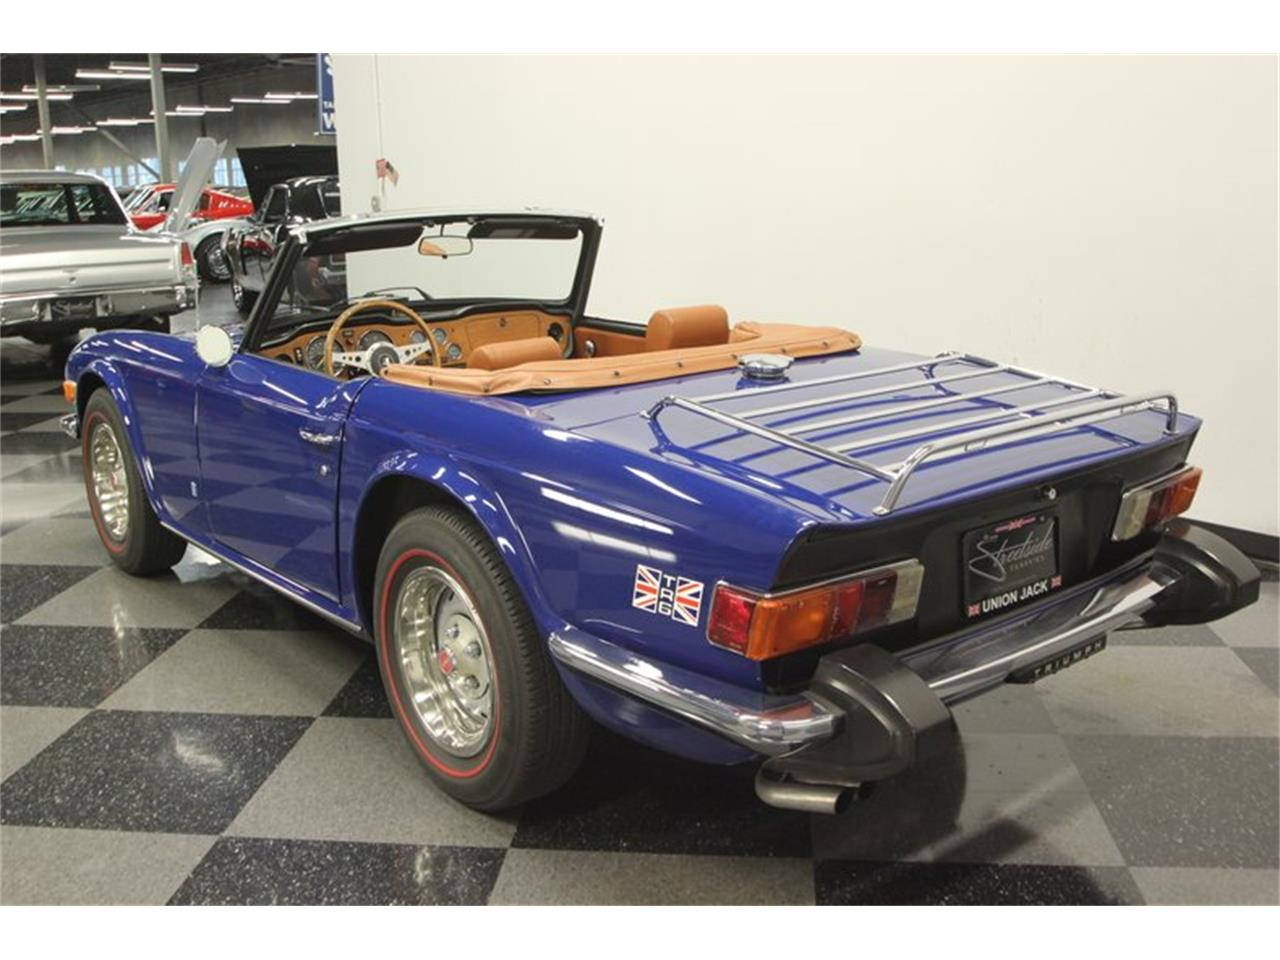 1975 Triumph Tr6 For Sale Classiccarscom Cc 1141358